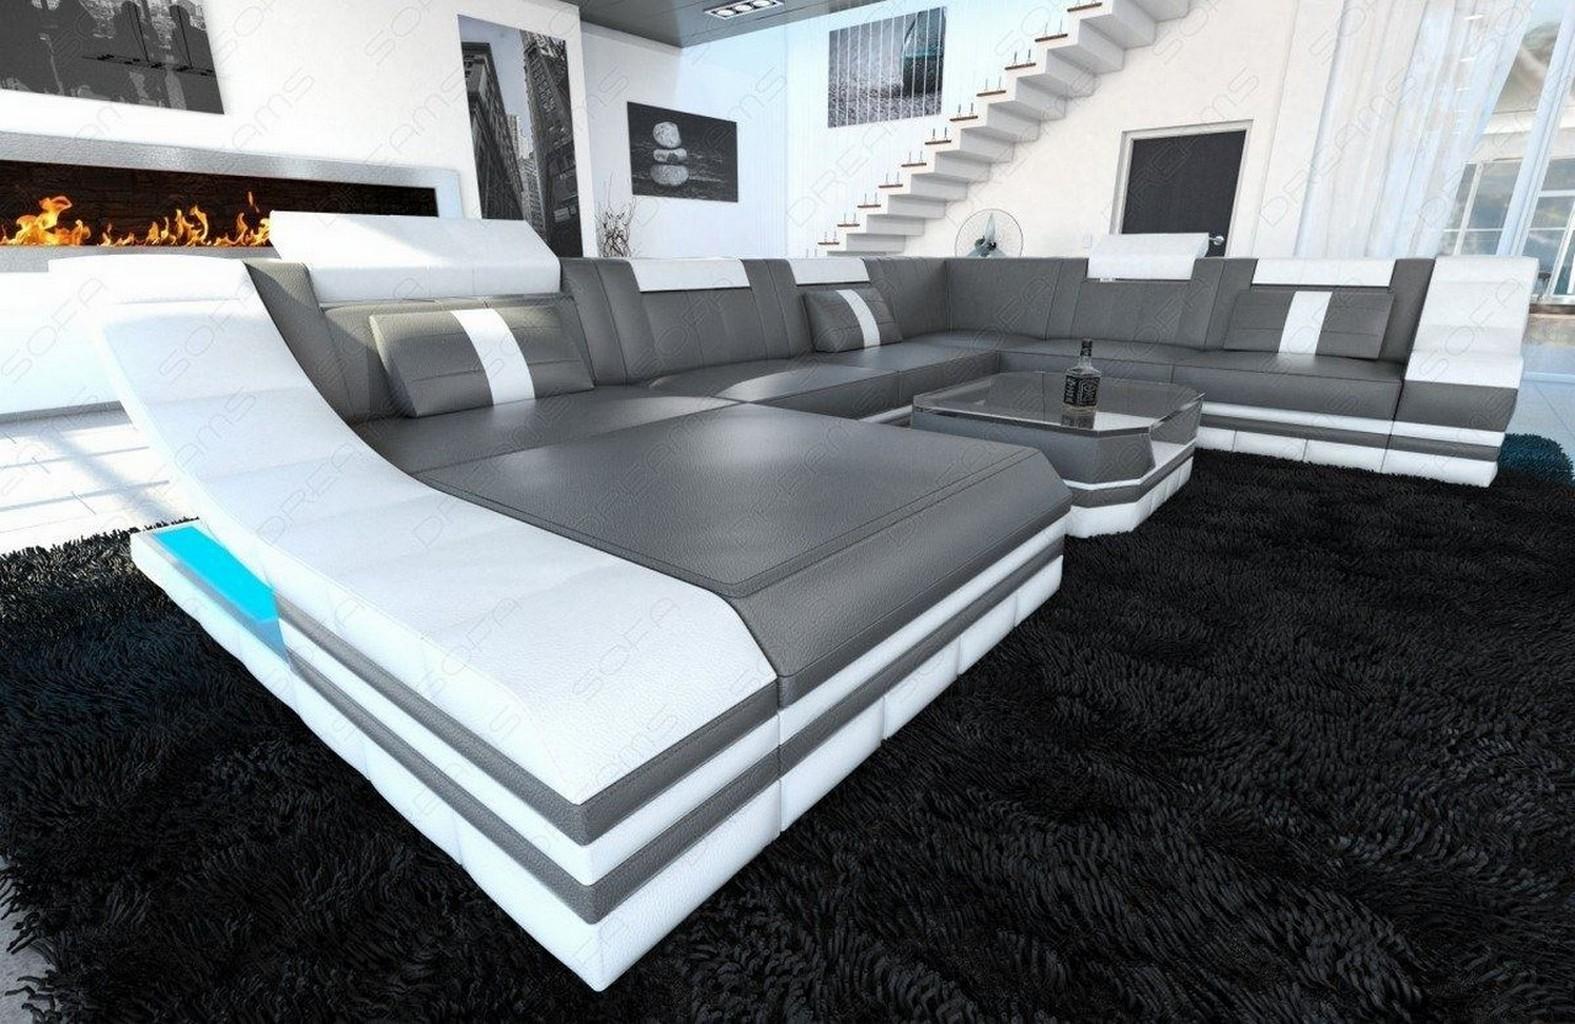 wohnlandschaft turino xl mit led beleuchtung sofa leder ledercouch grau wei ebay. Black Bedroom Furniture Sets. Home Design Ideas